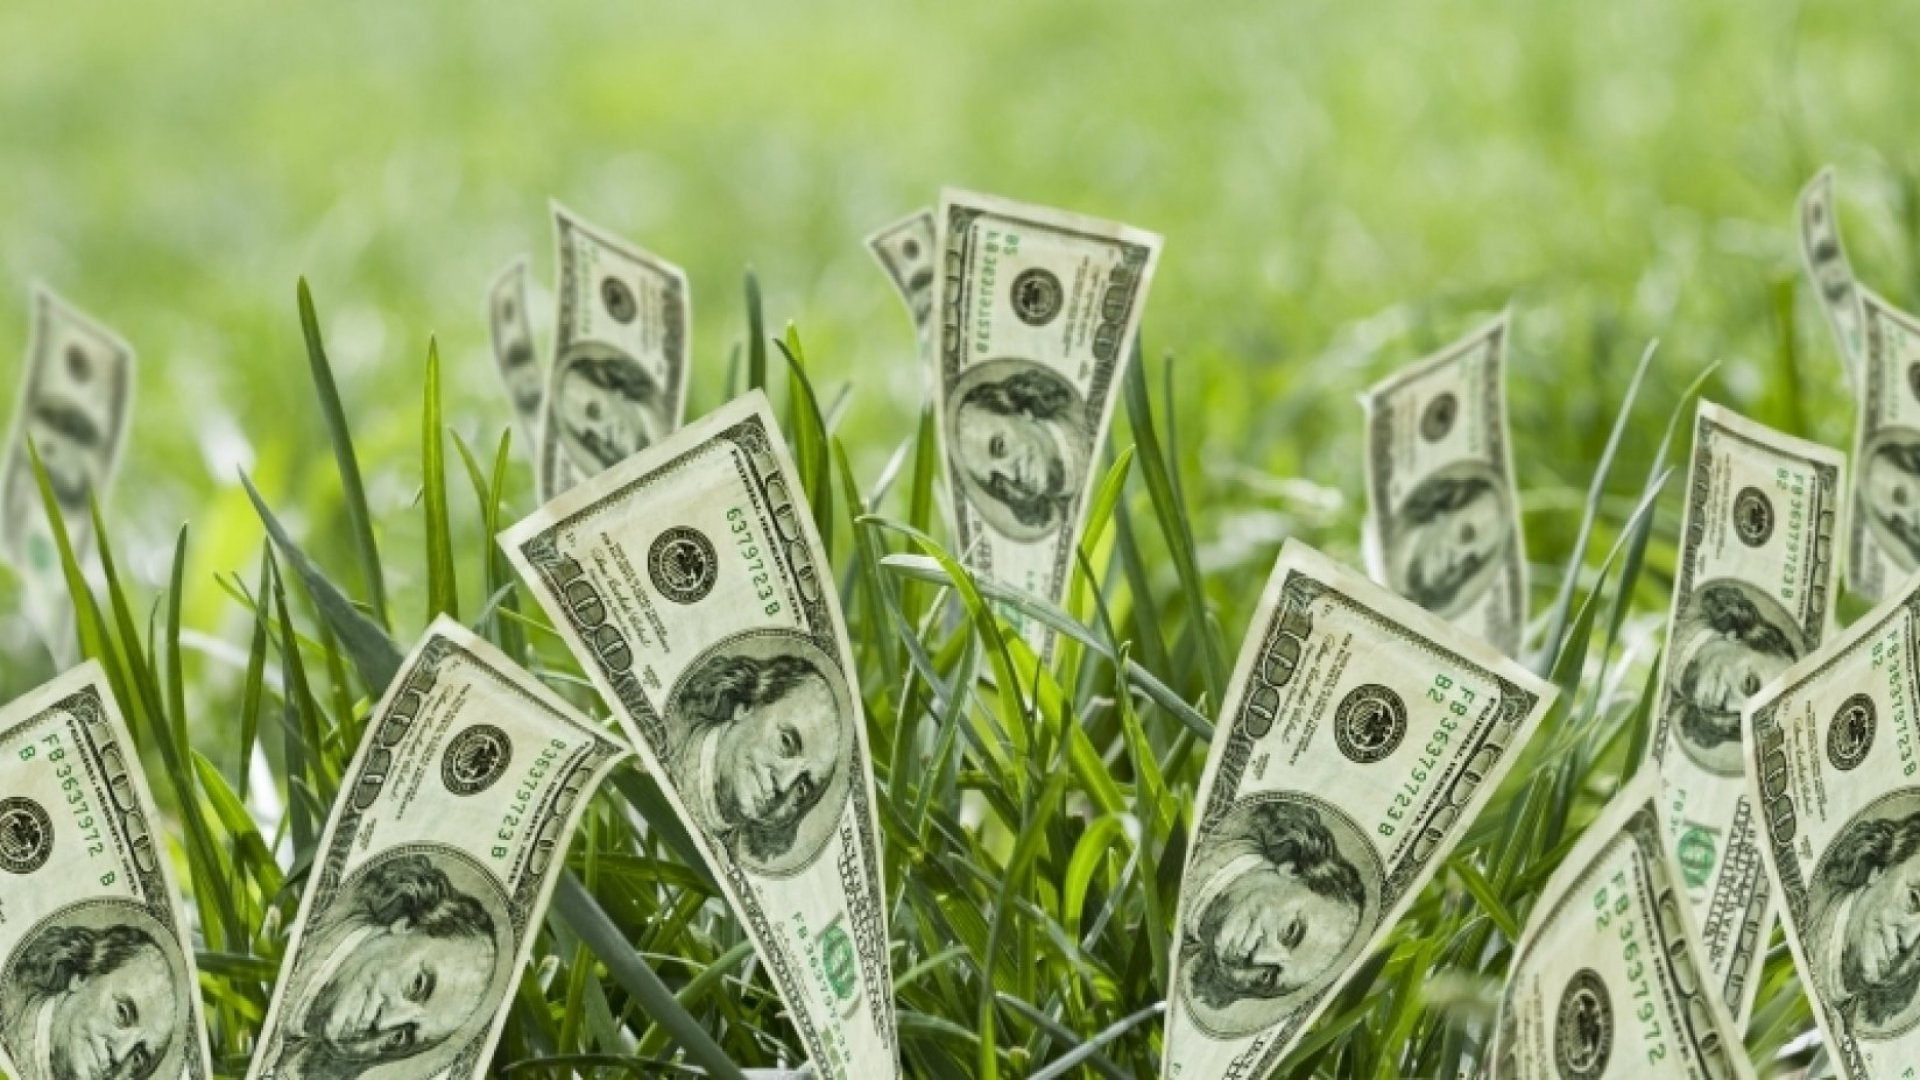 Does It Really Take Money to Make Money? | Inc.com